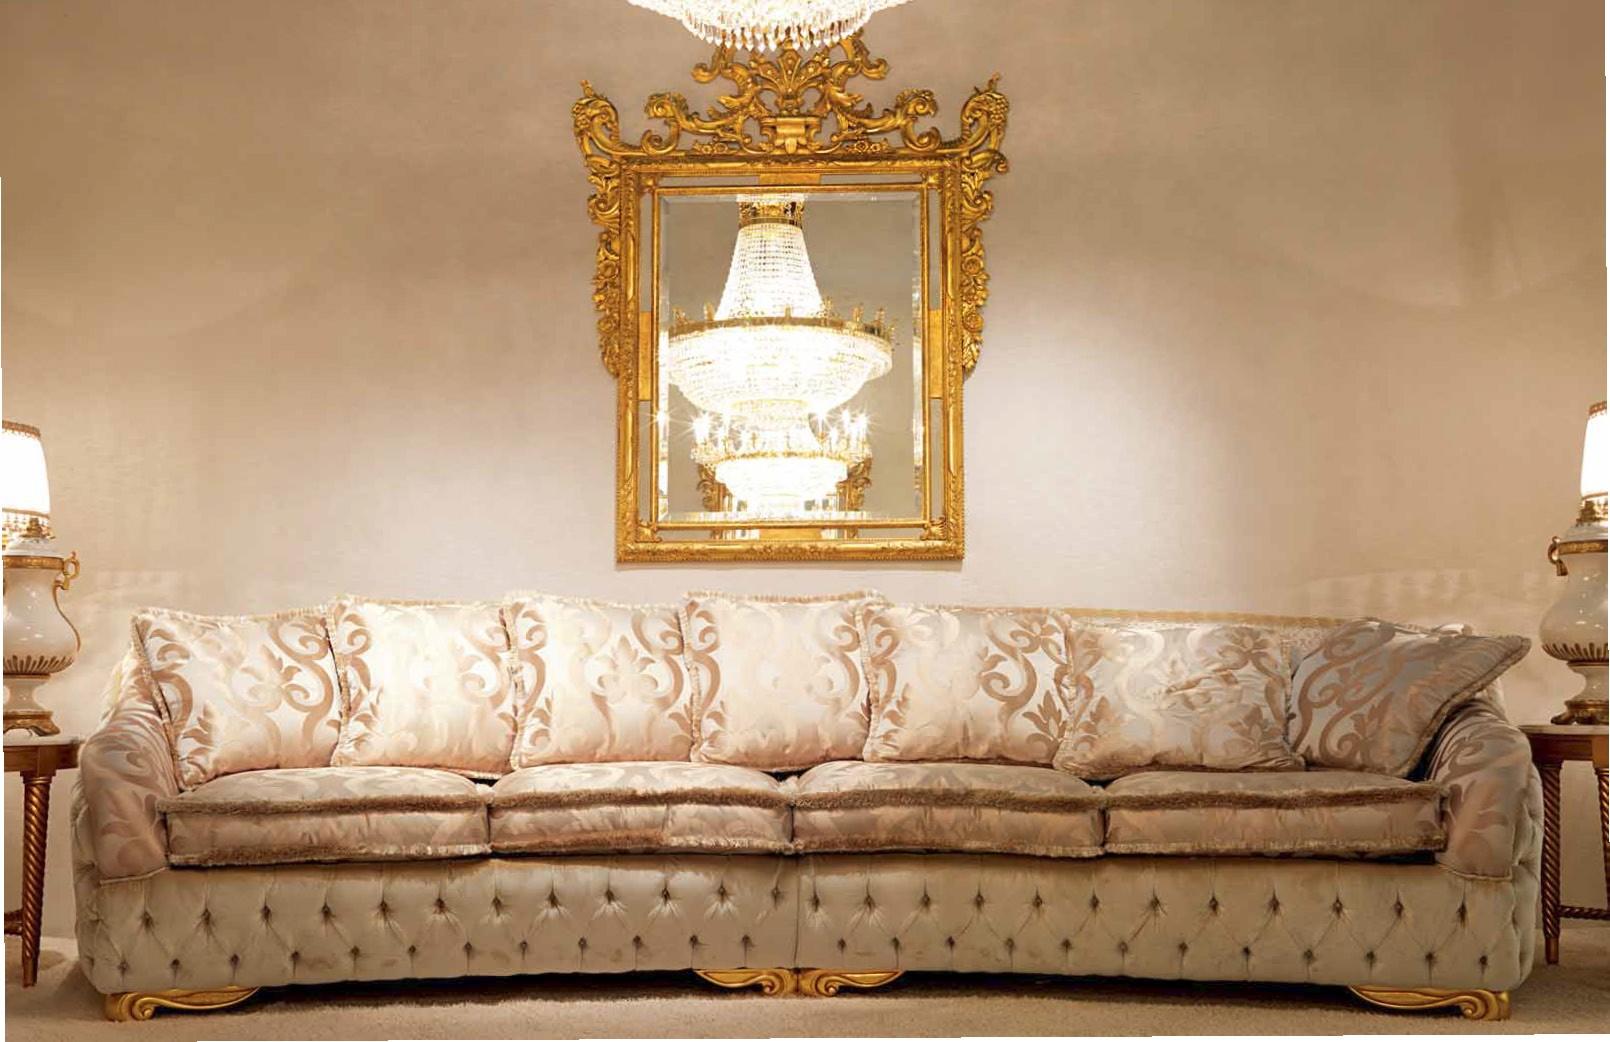 High End And Elegant Plush Living Room Furniture Set